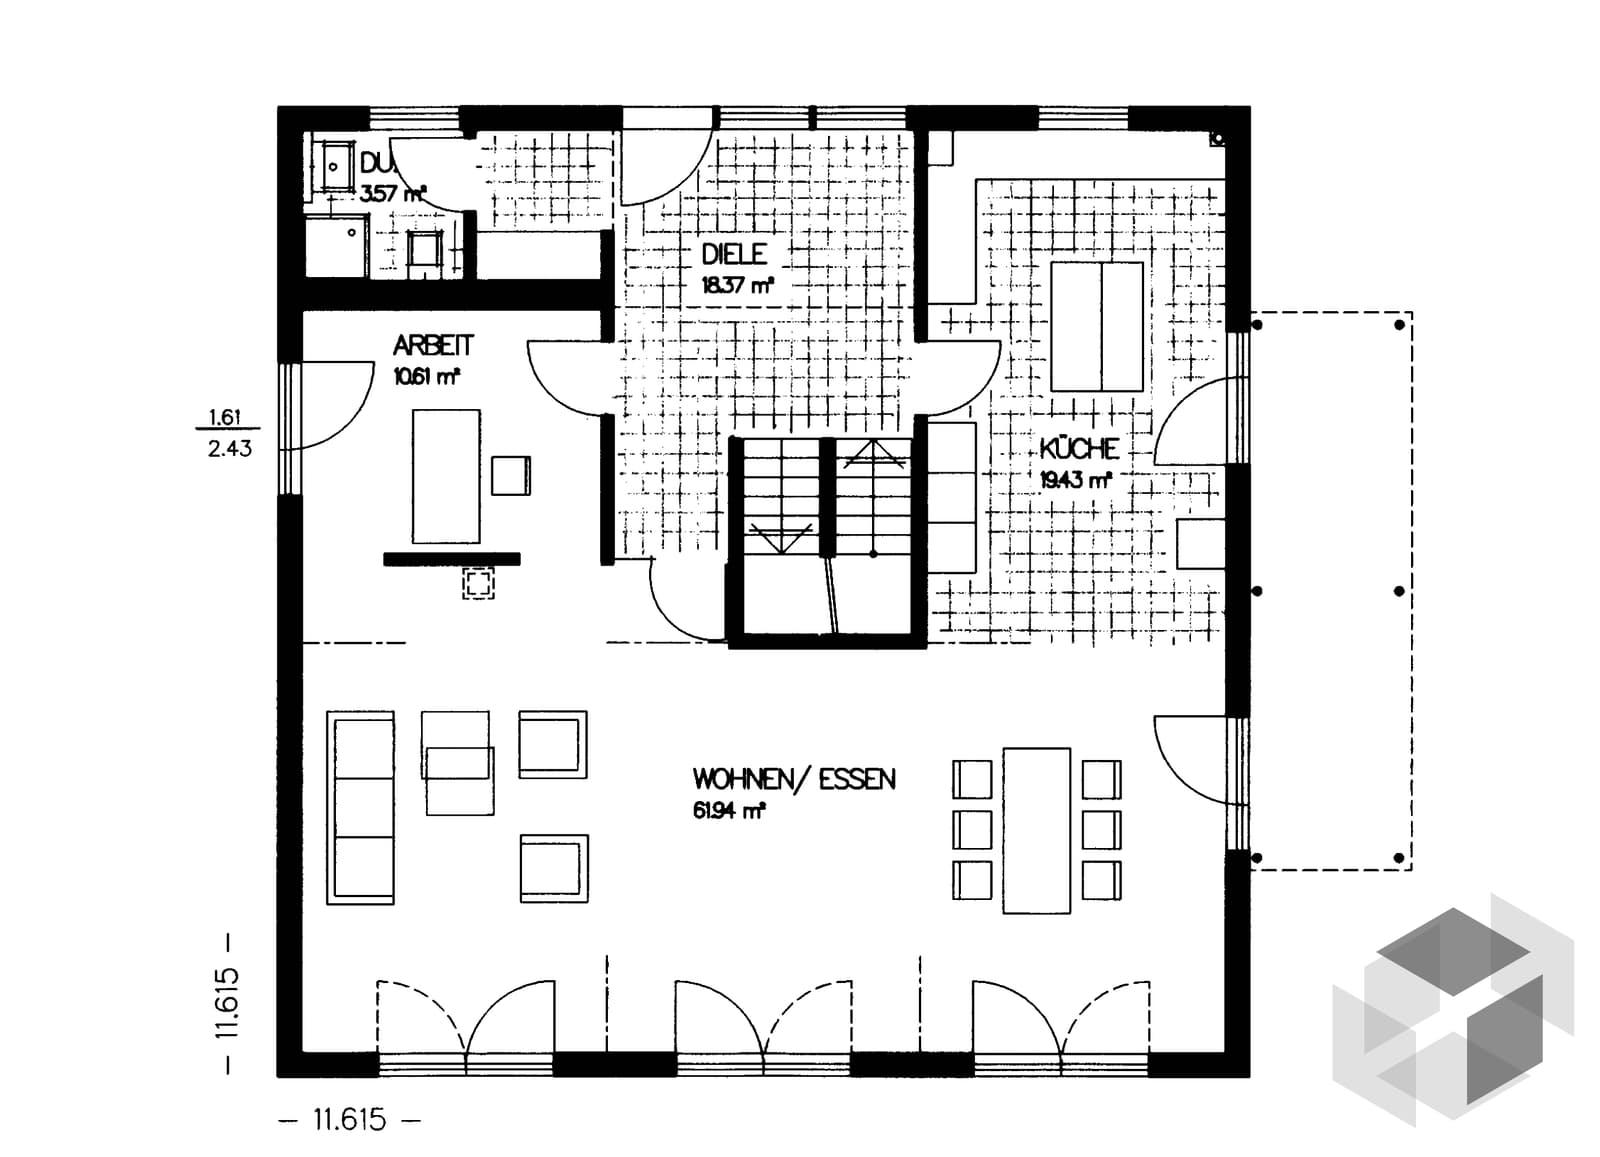 was bedeutet ausbauhaus was genau bedeutet ausbauhaus. Black Bedroom Furniture Sets. Home Design Ideas